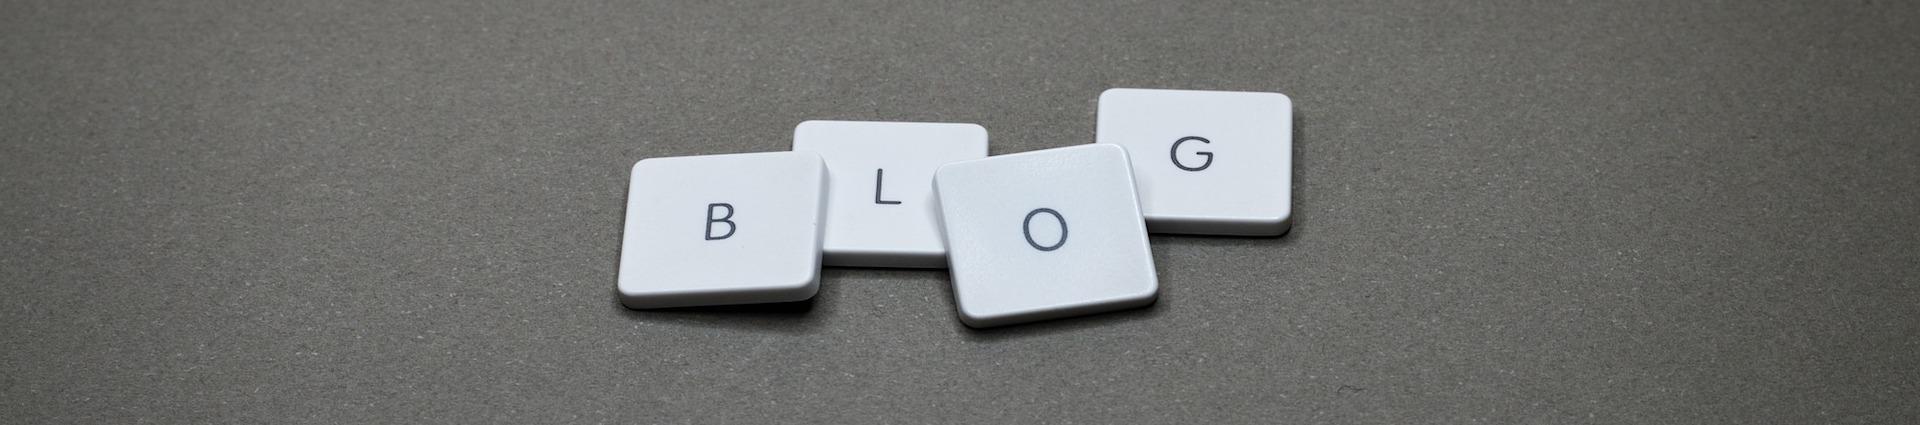 starqi blog 3 - Qi-Health Blog